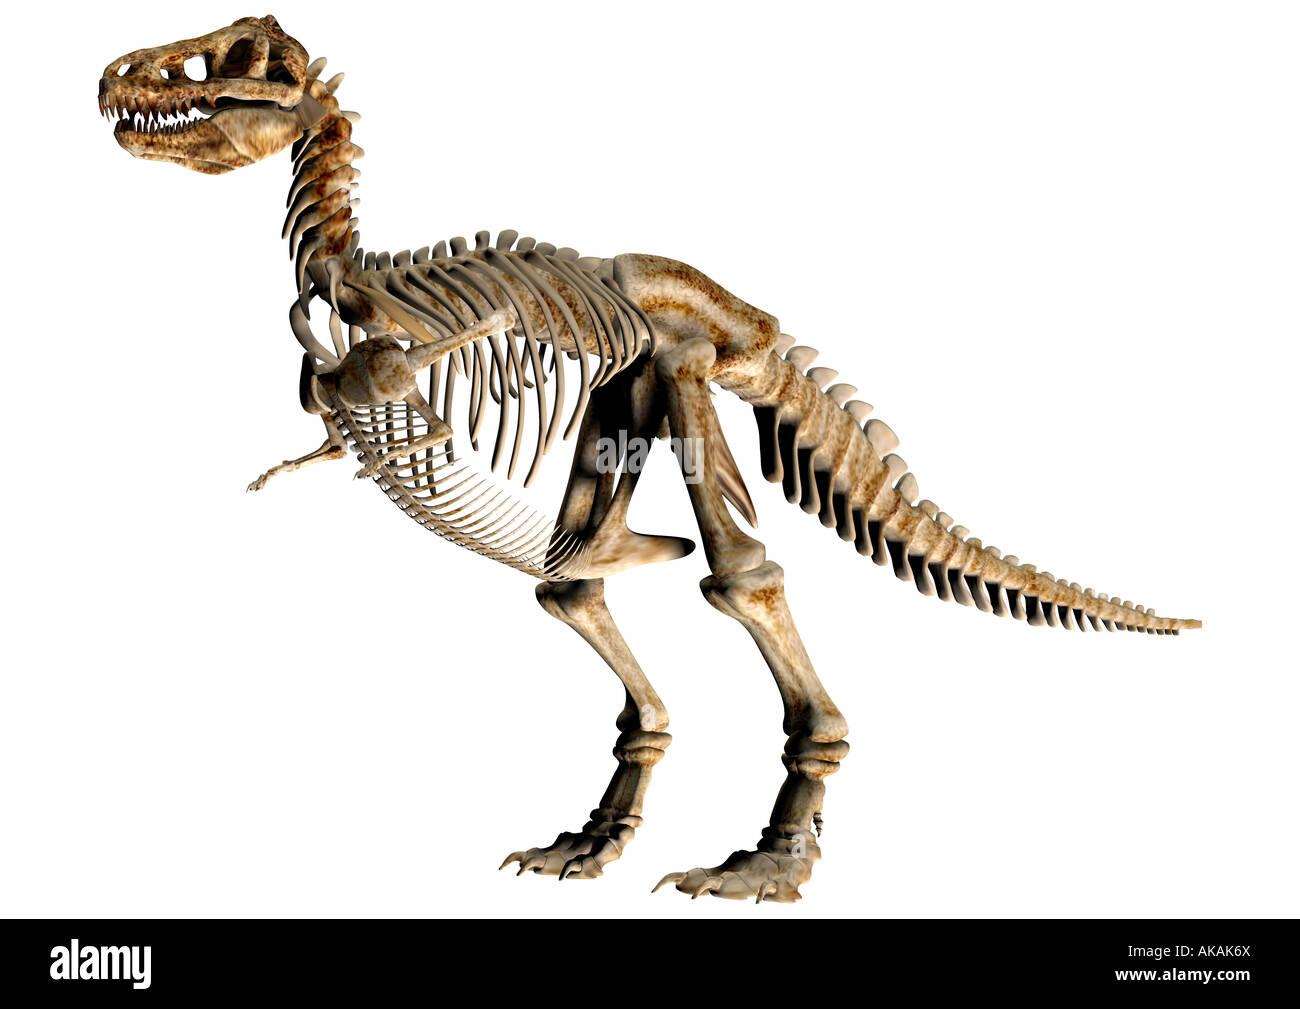 Squelette de dinosaure Dinosaurier Feststellung Photo Stock